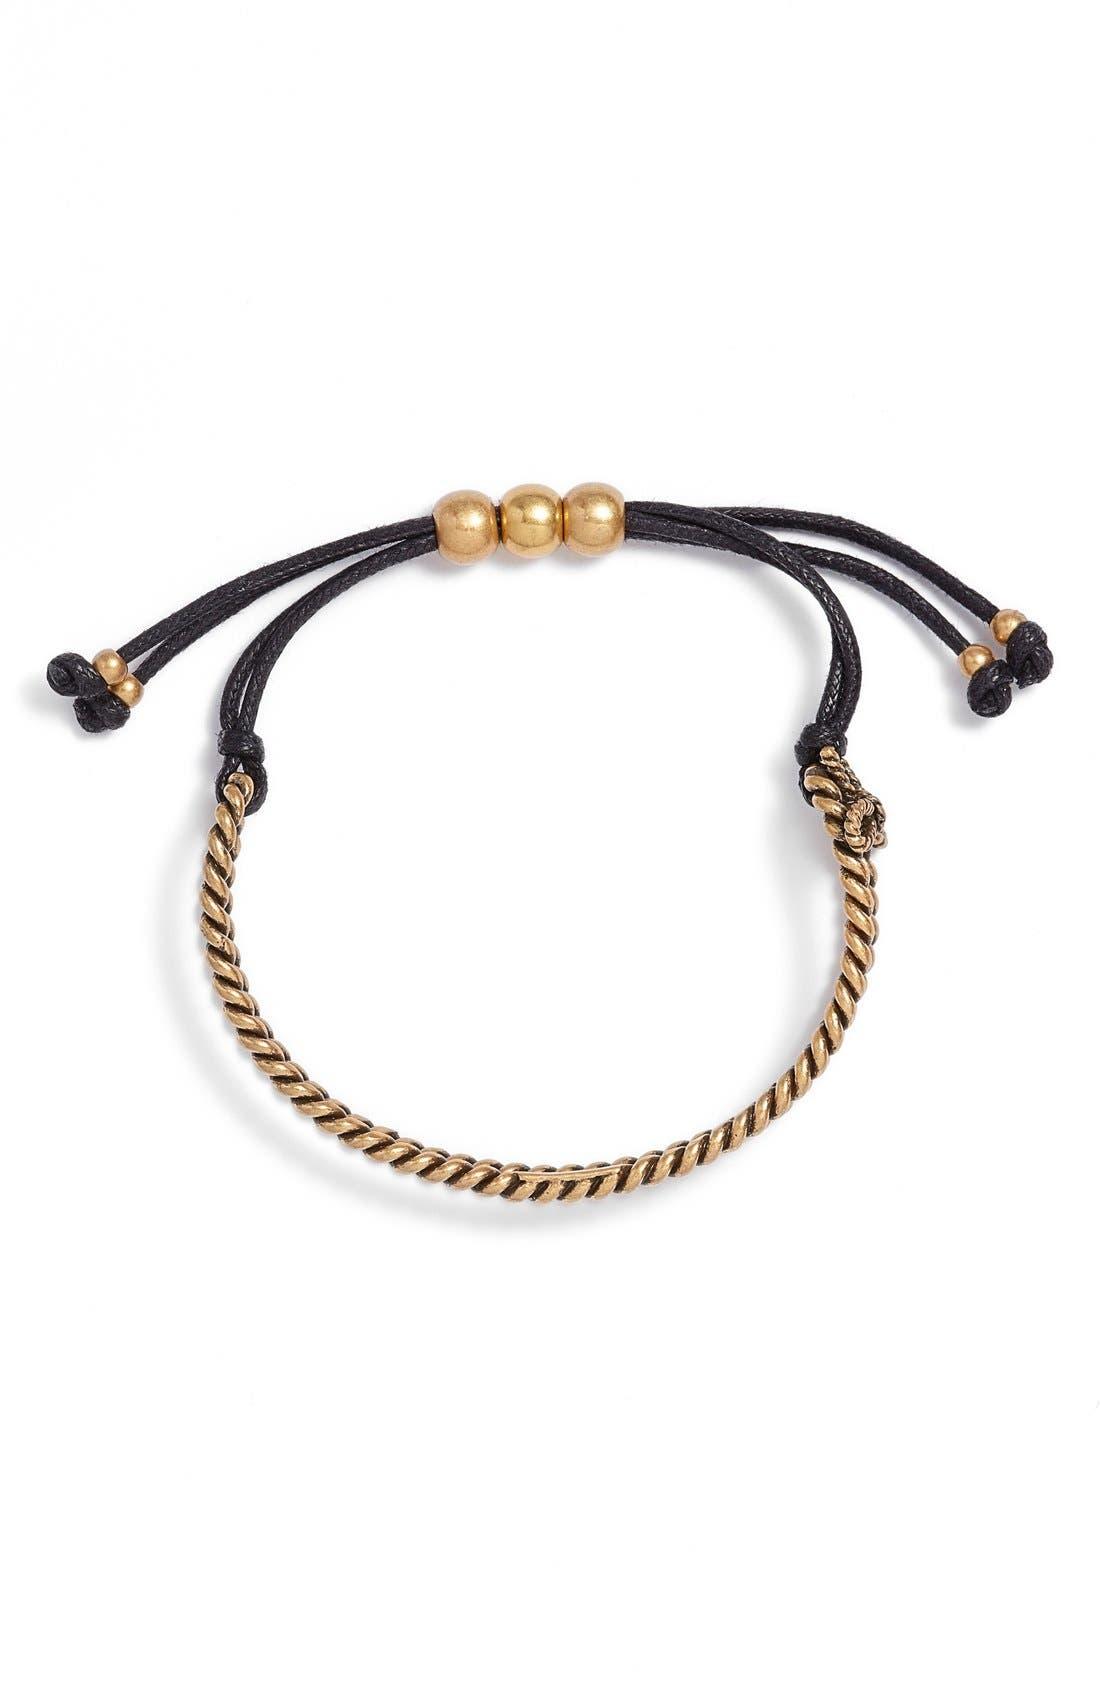 Alternate Image 1 Selected - MARC JACOBS Rope Friendship Bracelet